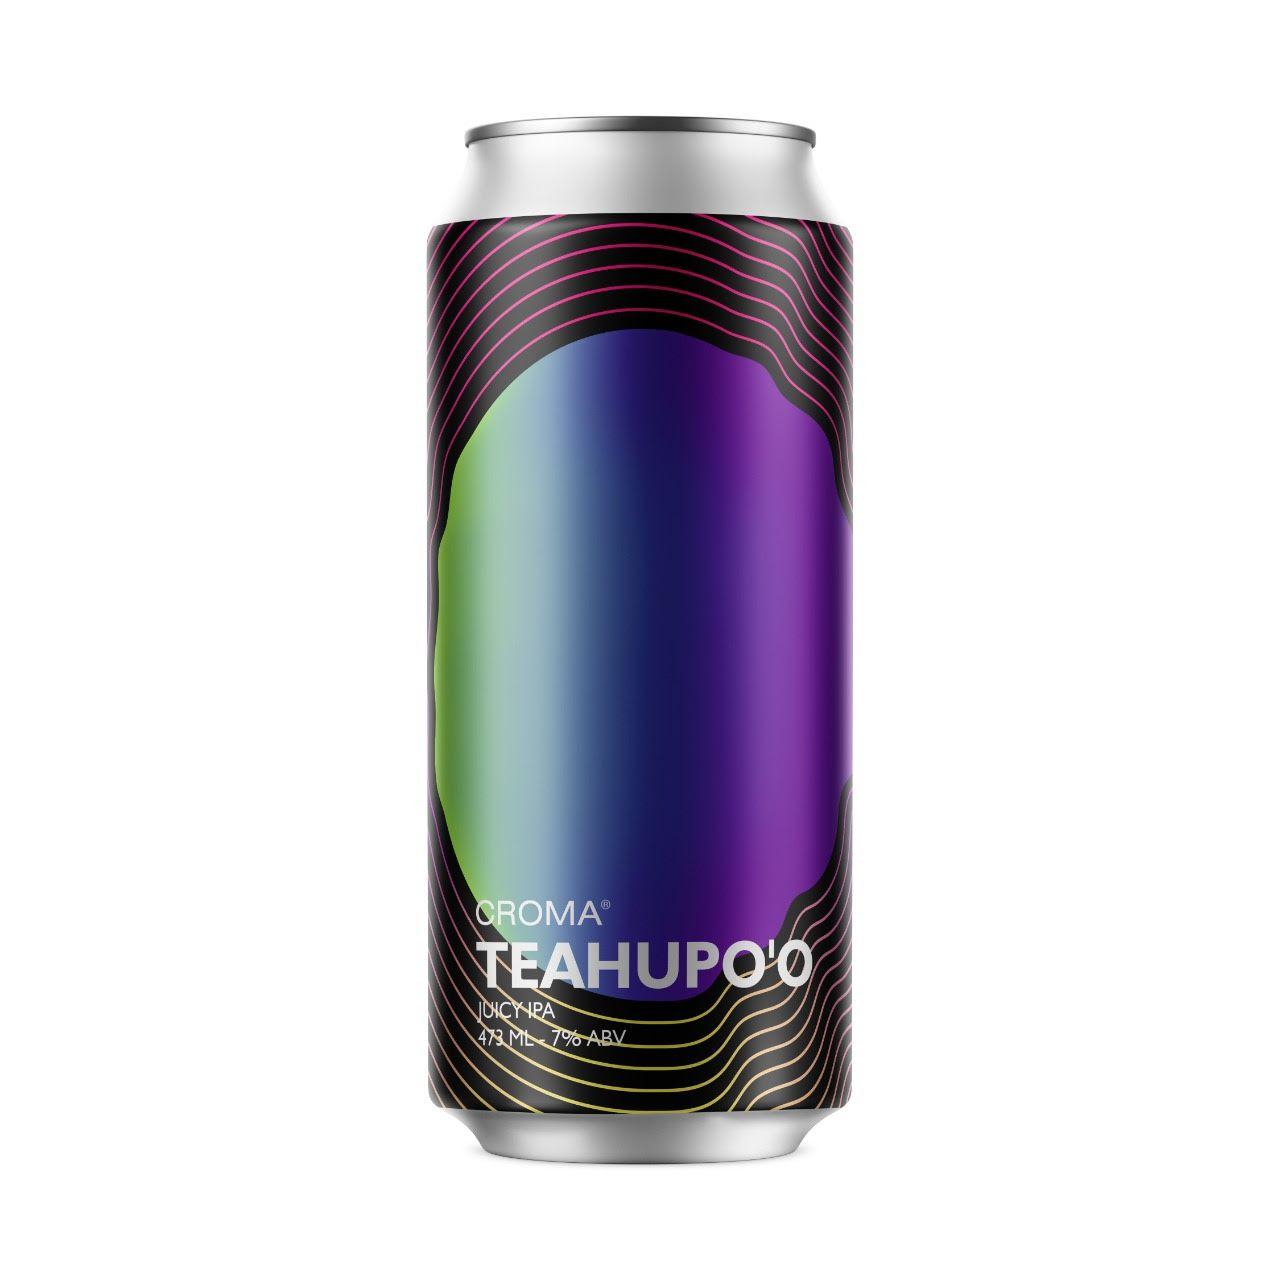 Croma Teahupo